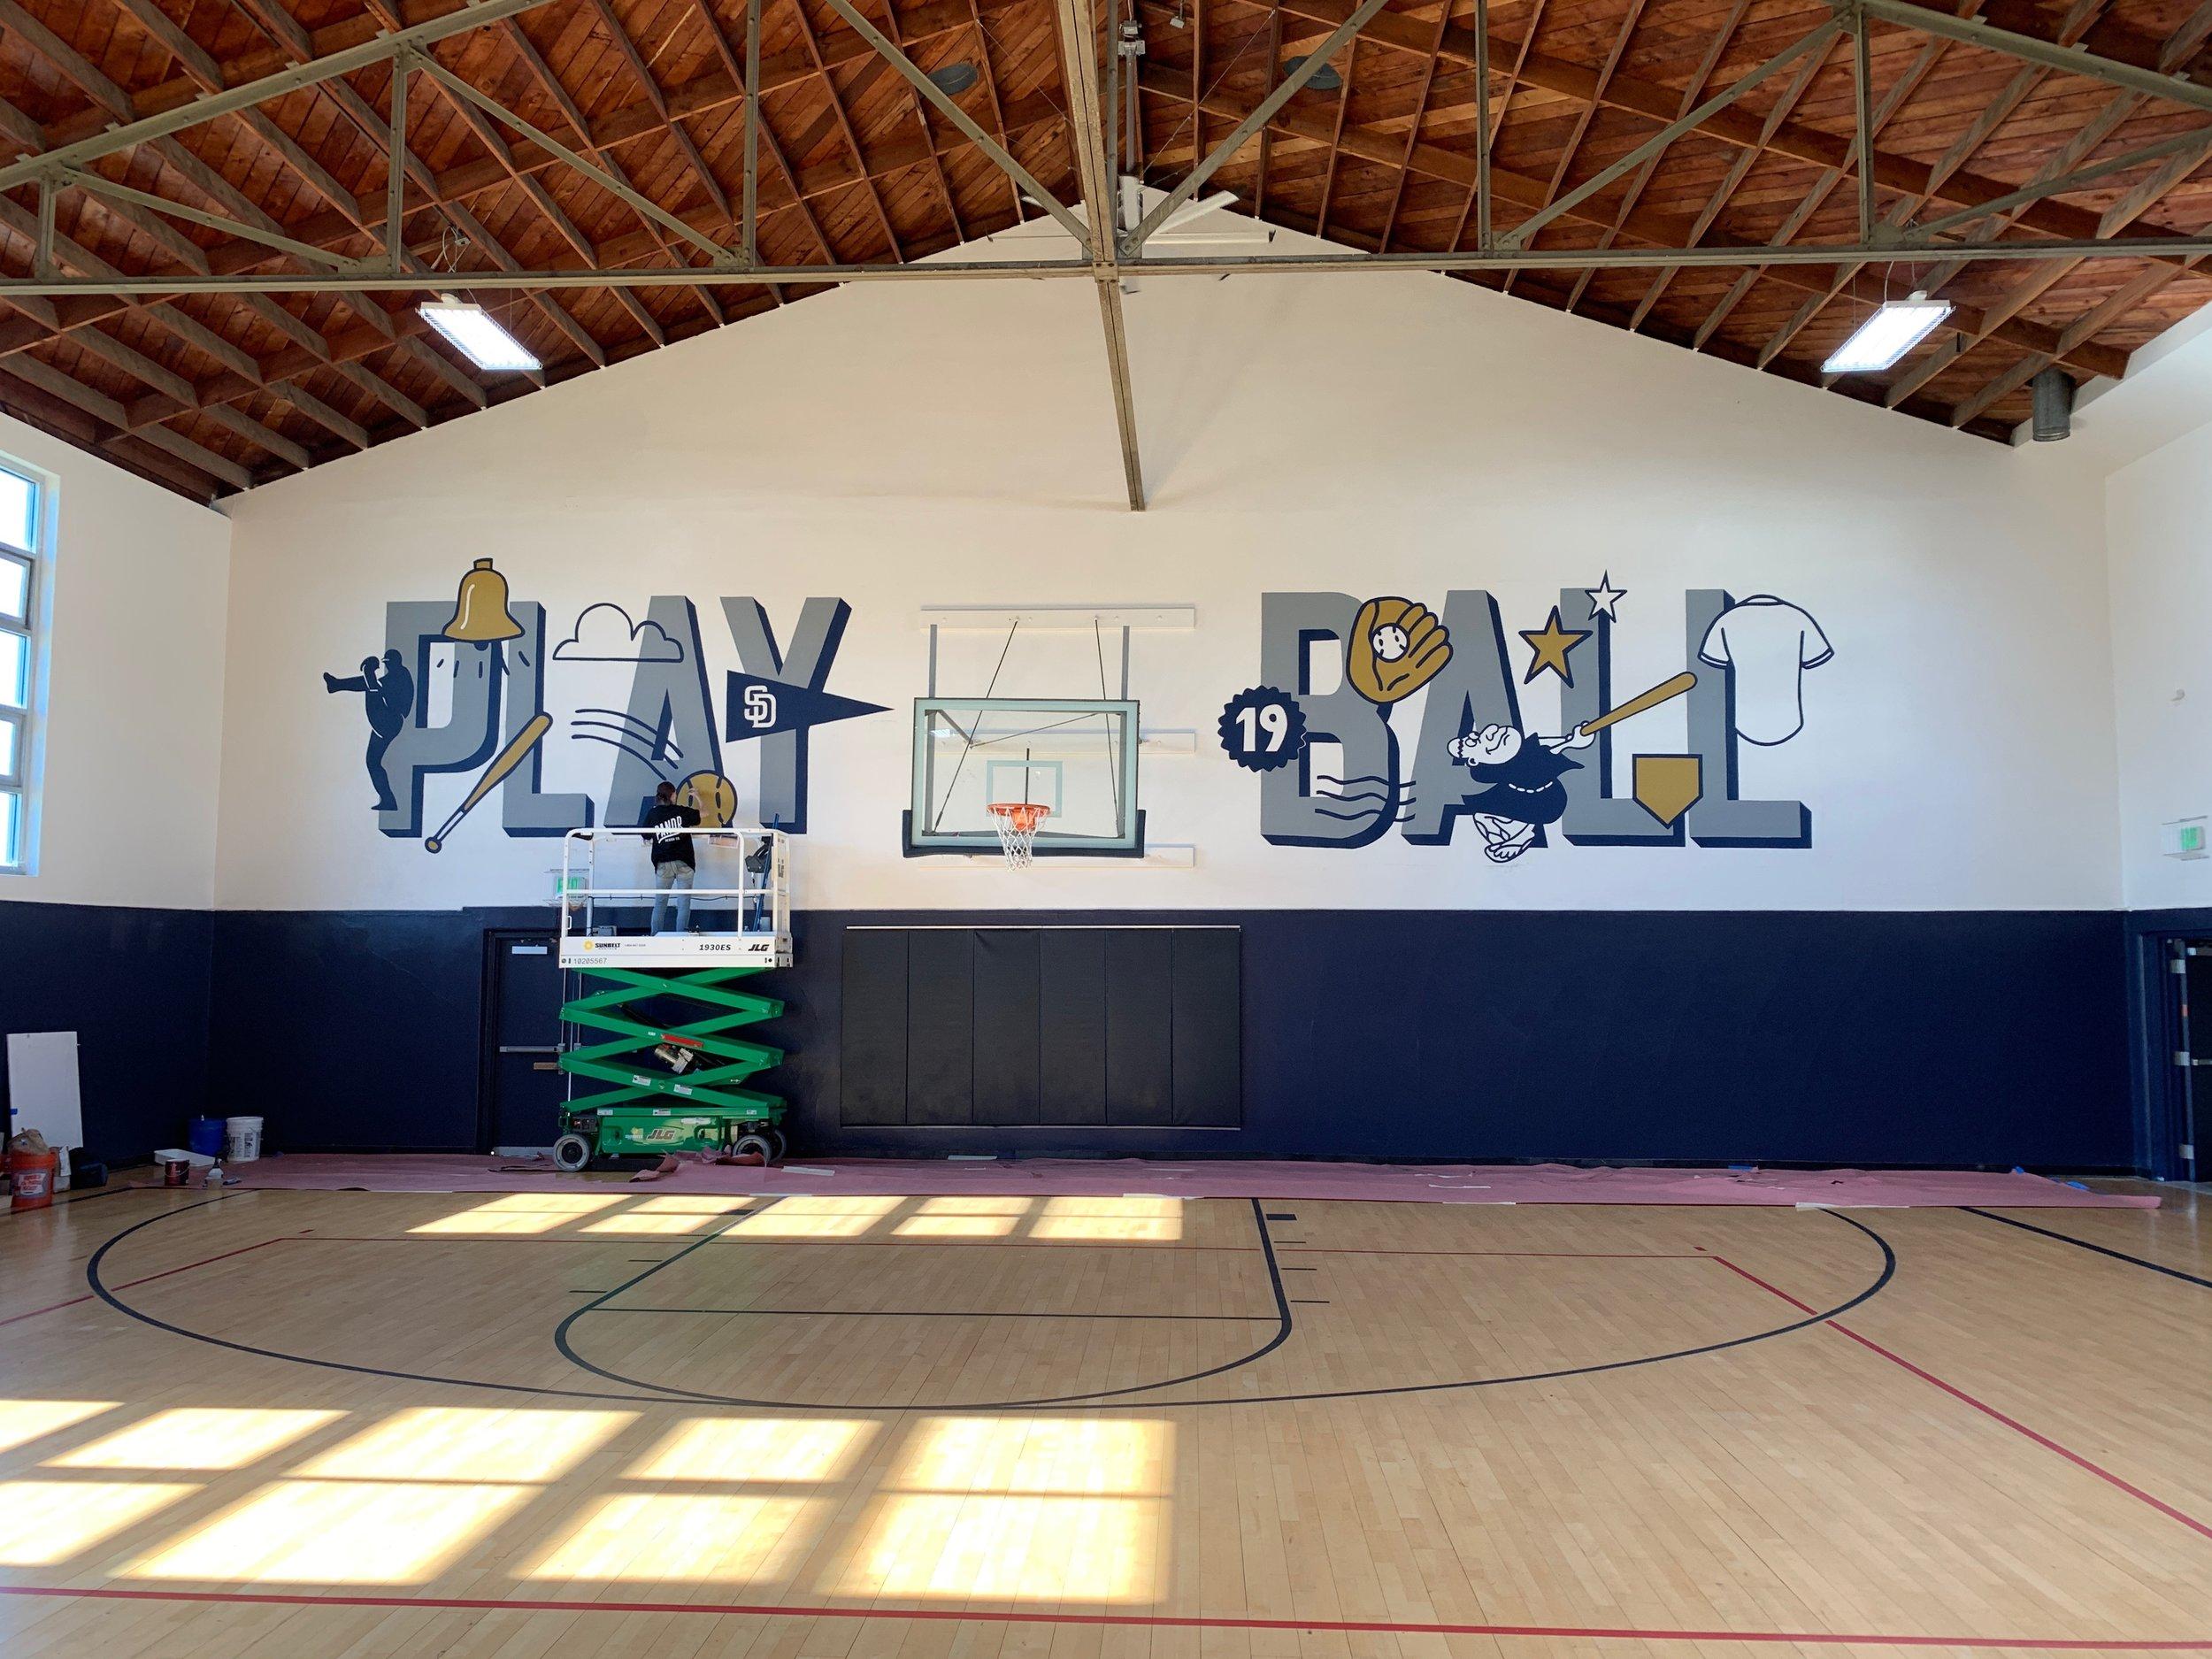 Custom play ball mural for the baseball team, the san diego padres